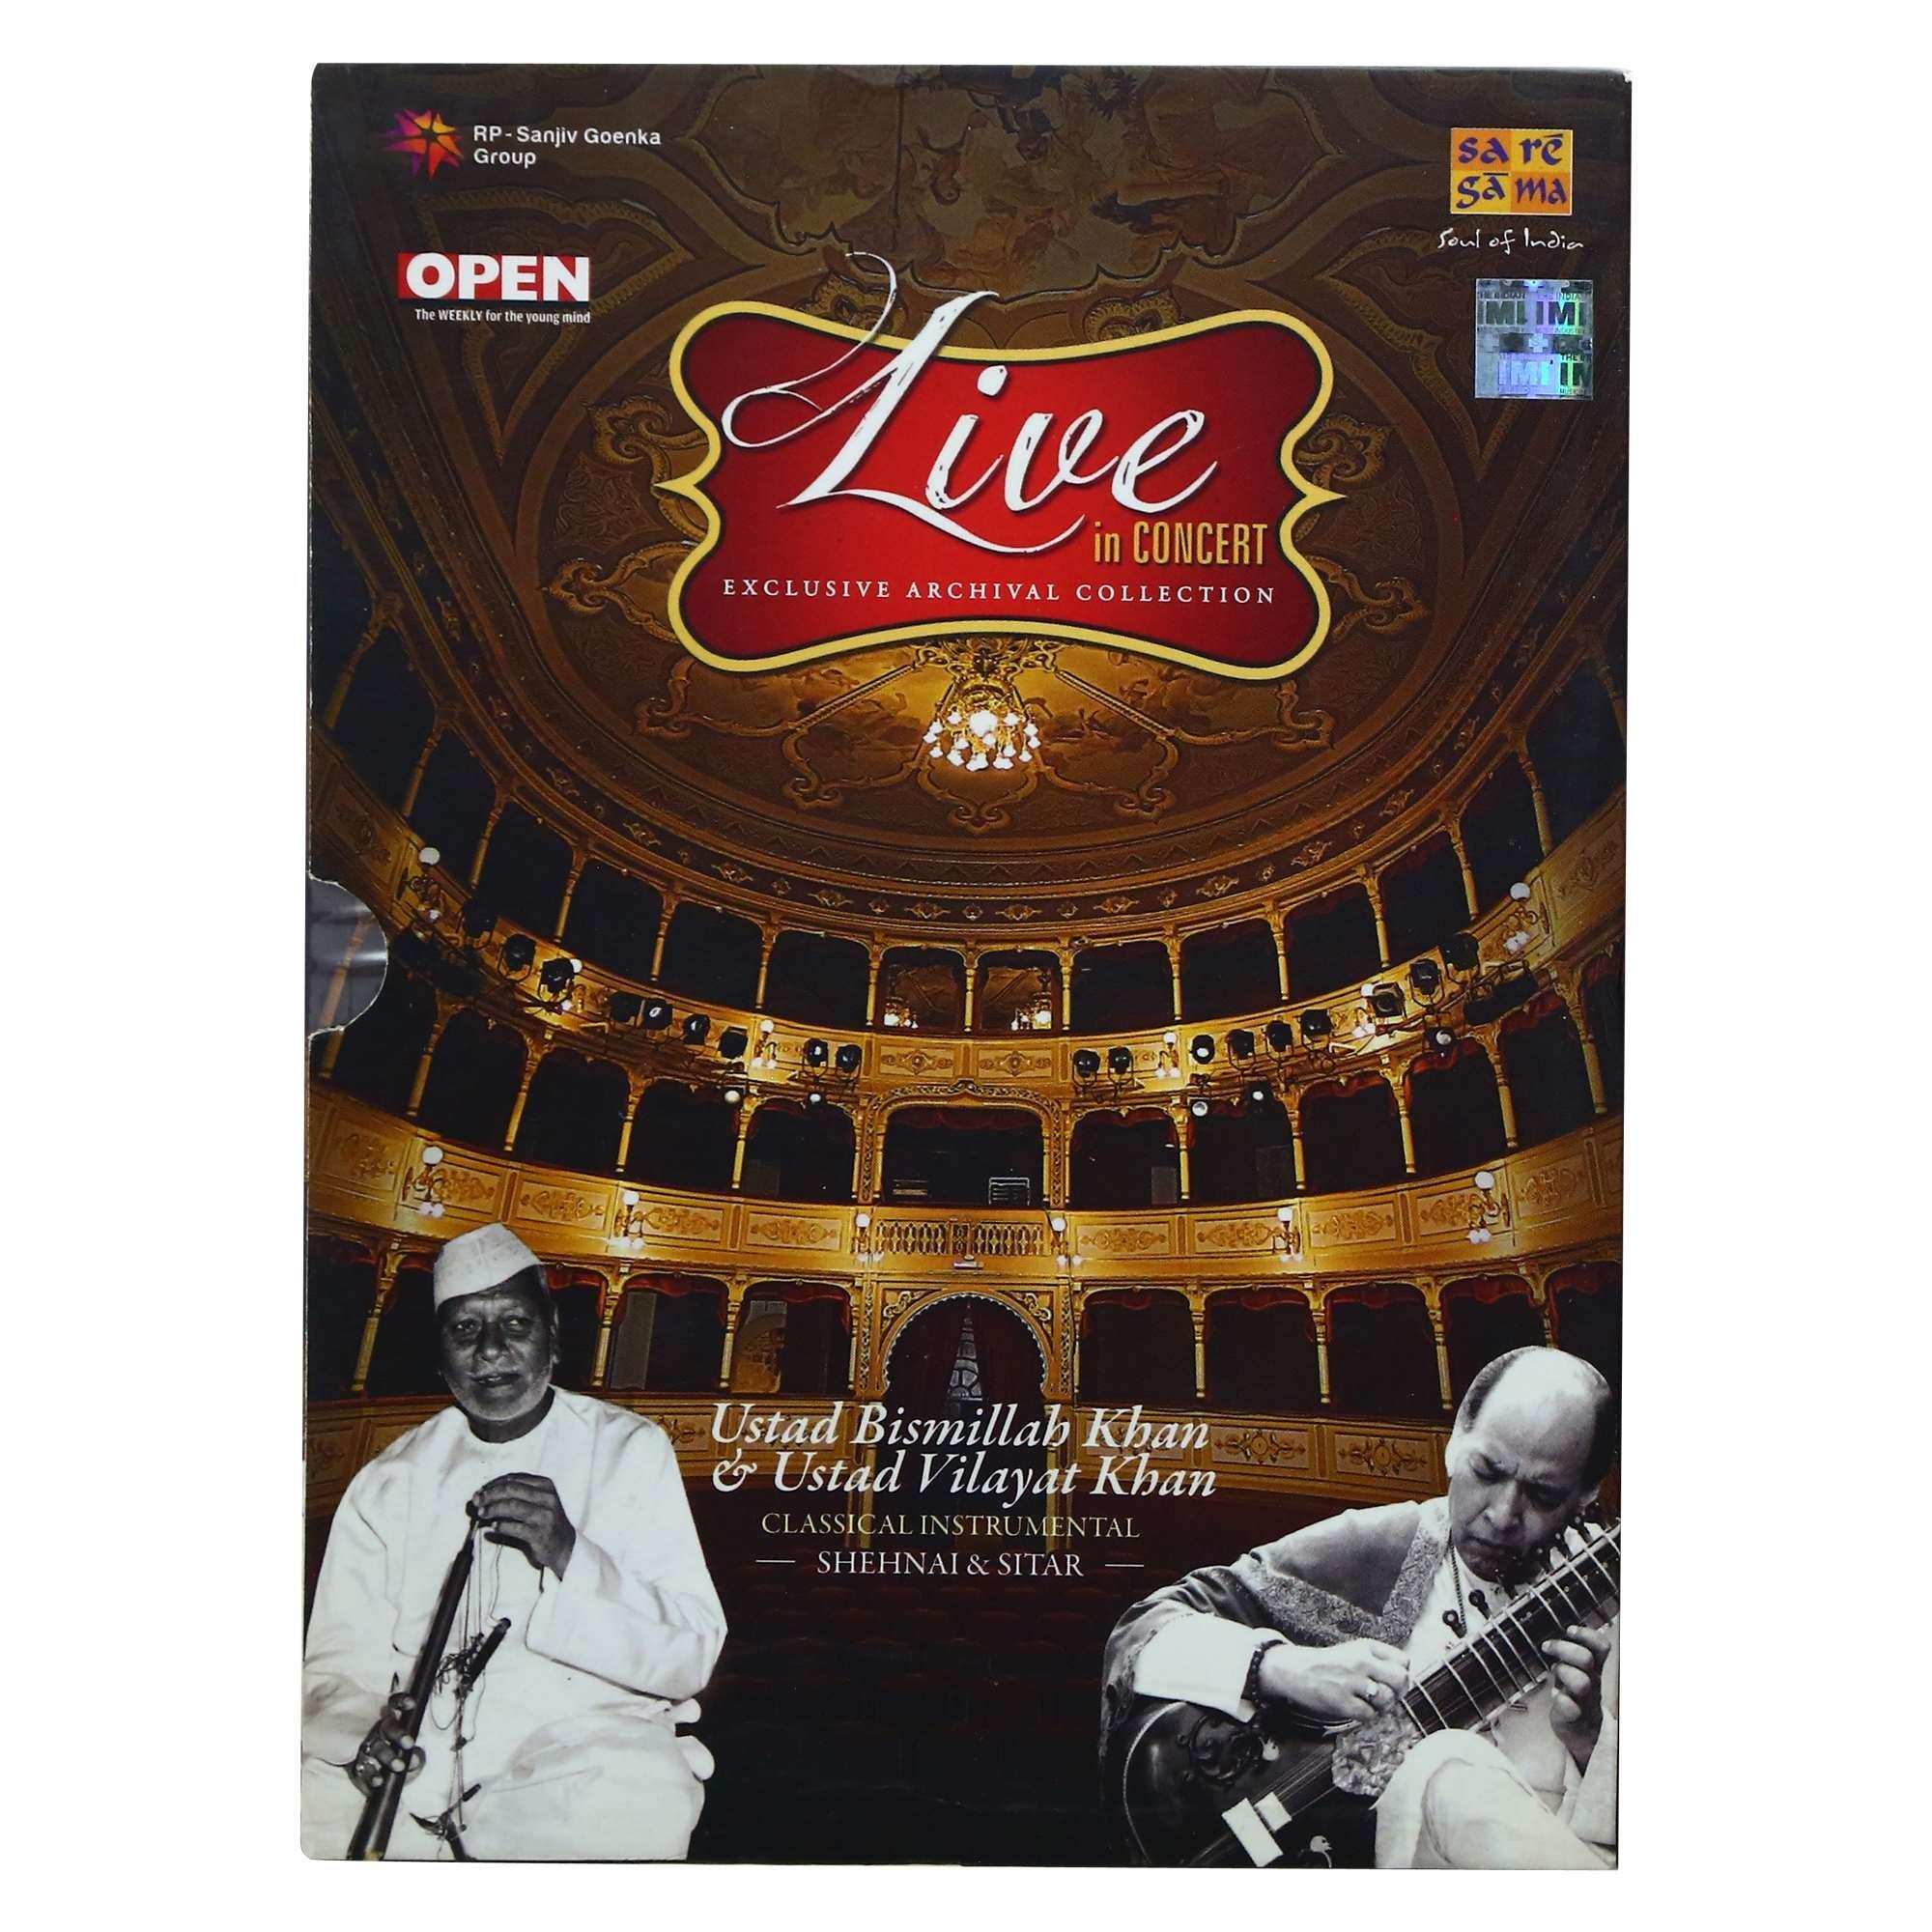 Live In Concert: Ustad Bismillah Khan & Ustad Vilayat Khan (Classical Instrumental): Shehnai and Sitar (Set of 2 Audio CDs) by Saregama